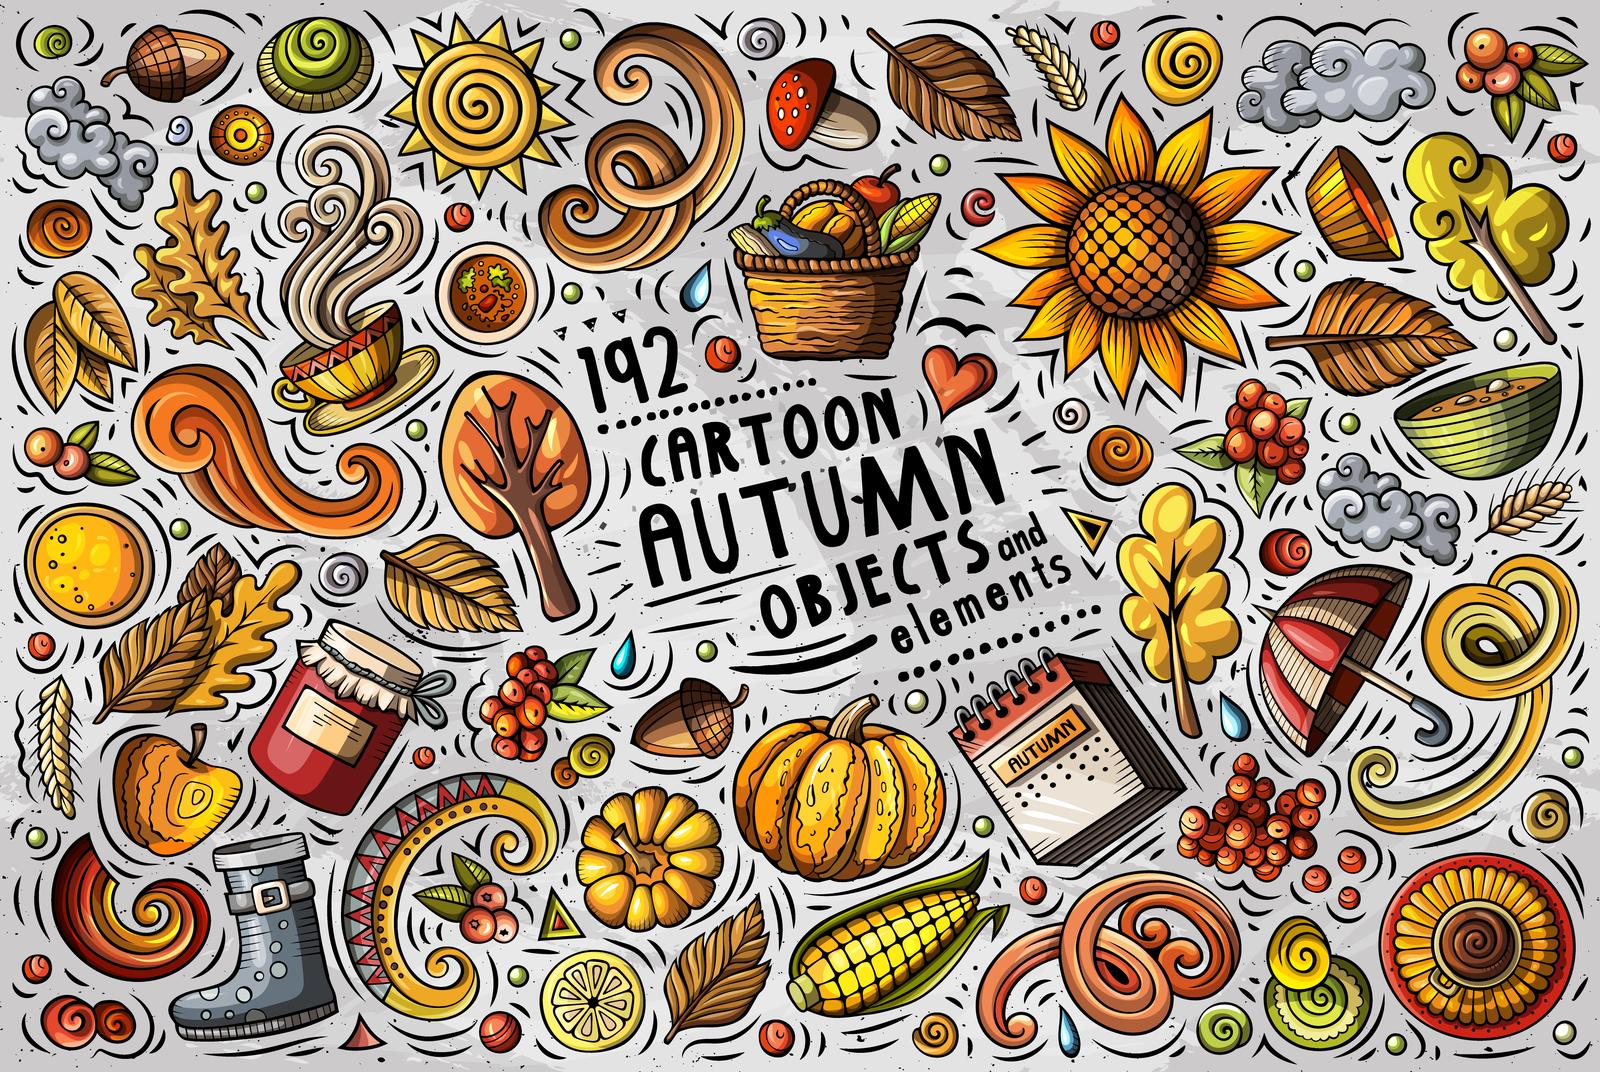 Autumn Cartoon Objects Set